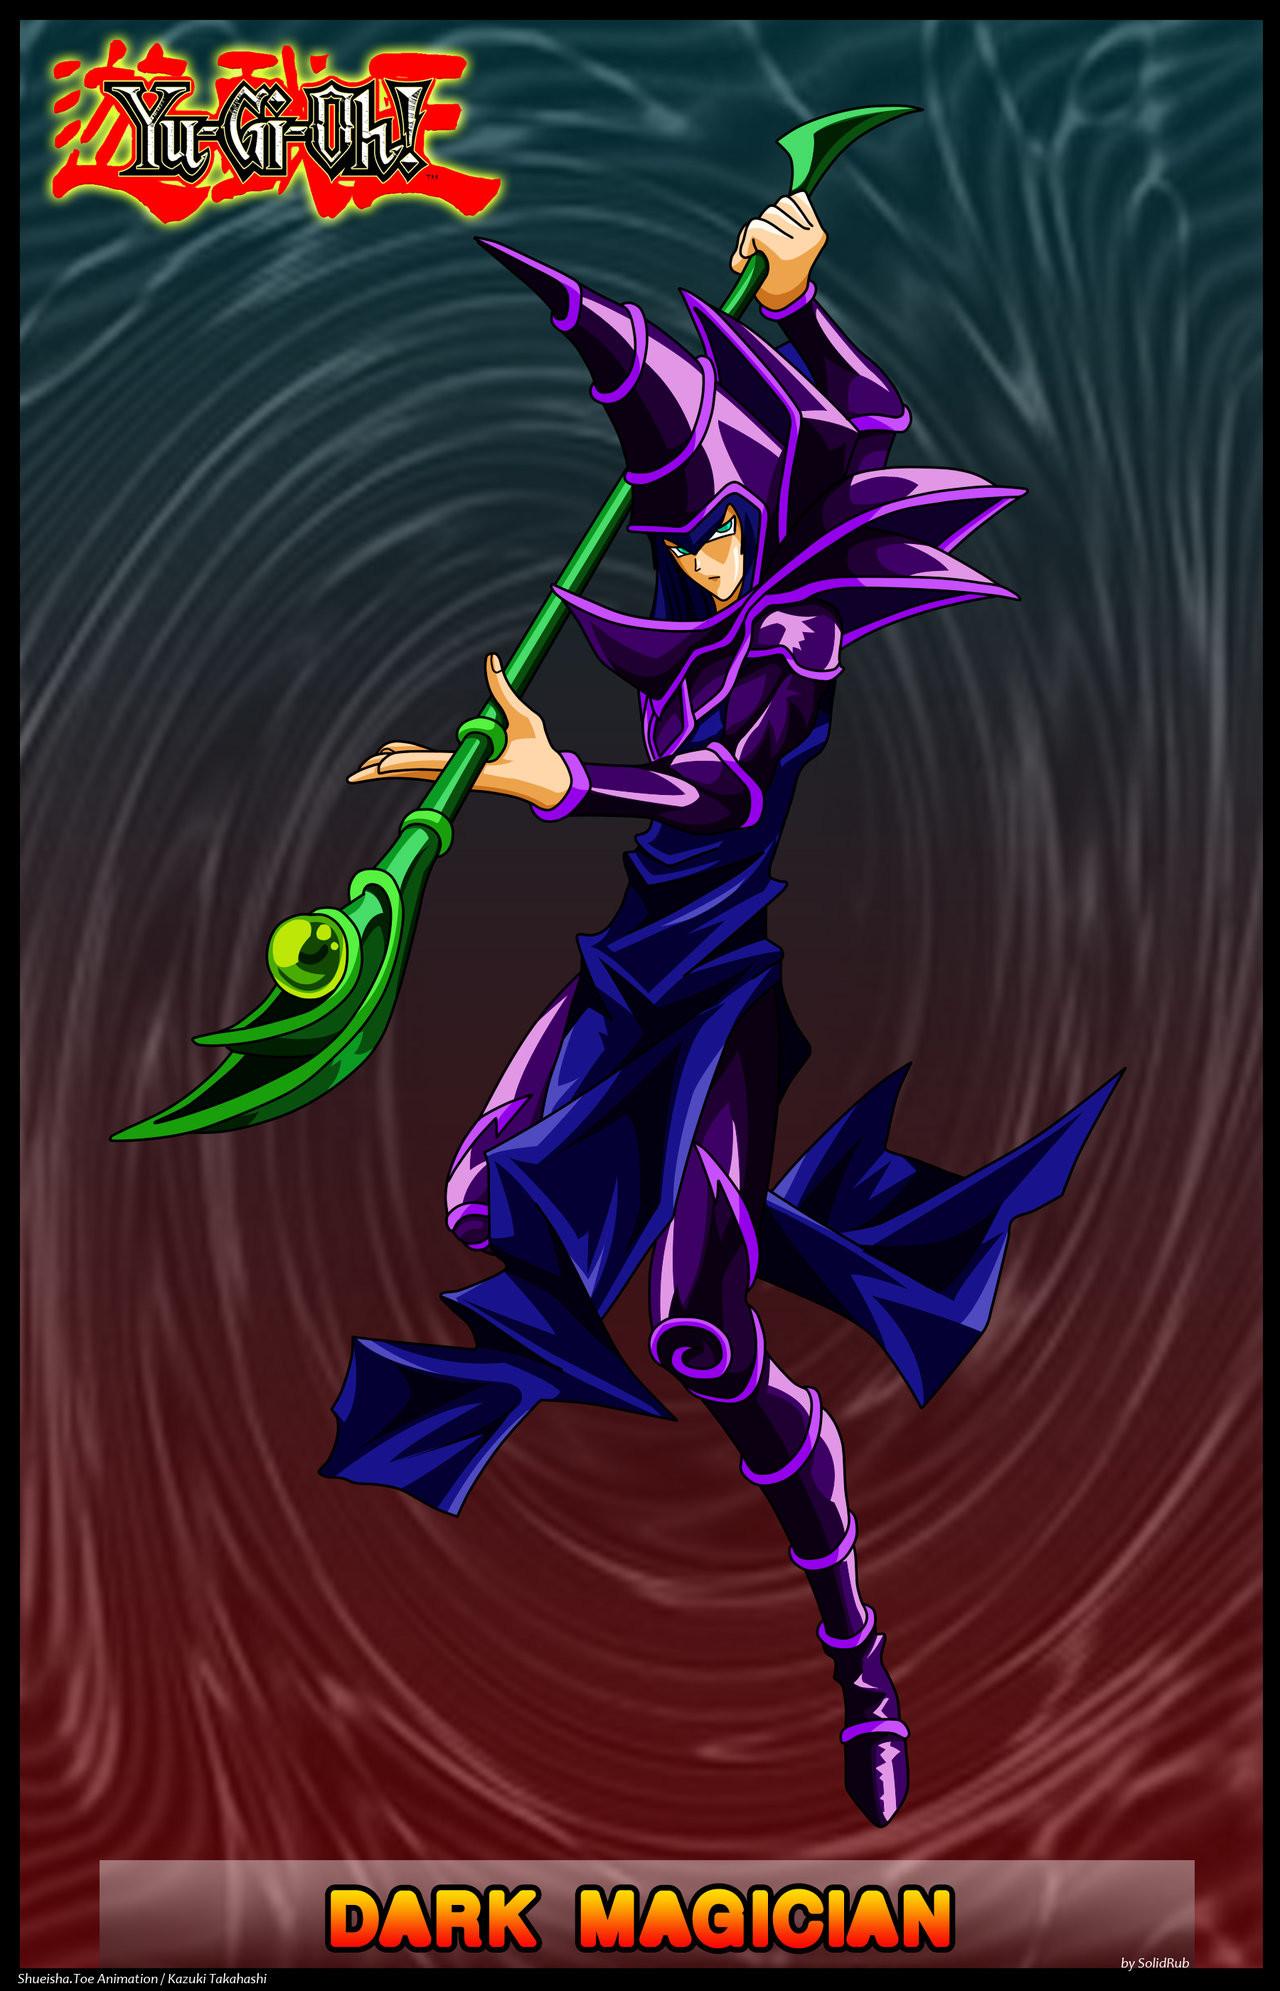 Dark Magician by solidrub Dark Magician by solidrub